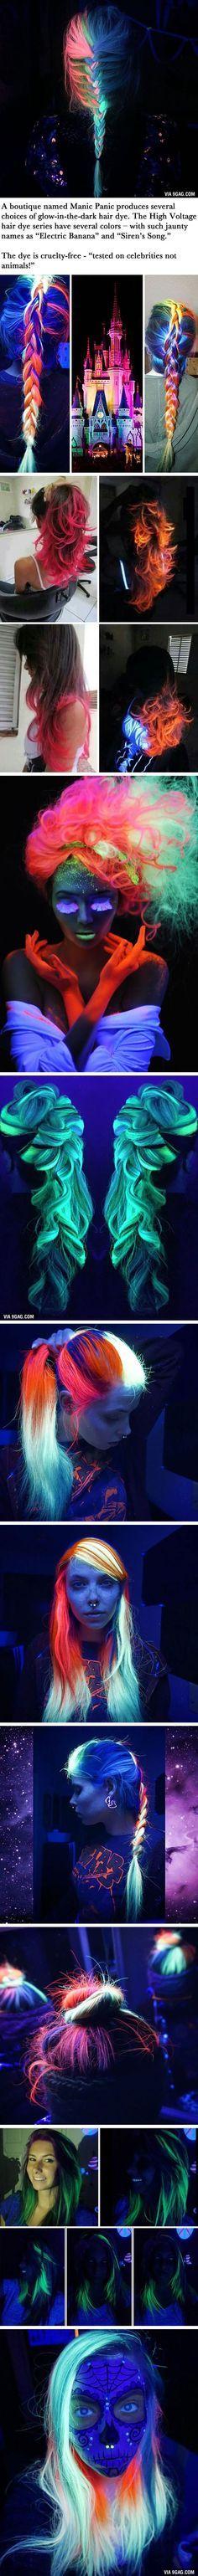 Rainbow Hair That Can Glow In The Dark Under Black Light Is Now A Thing (via Rainbowmegz)